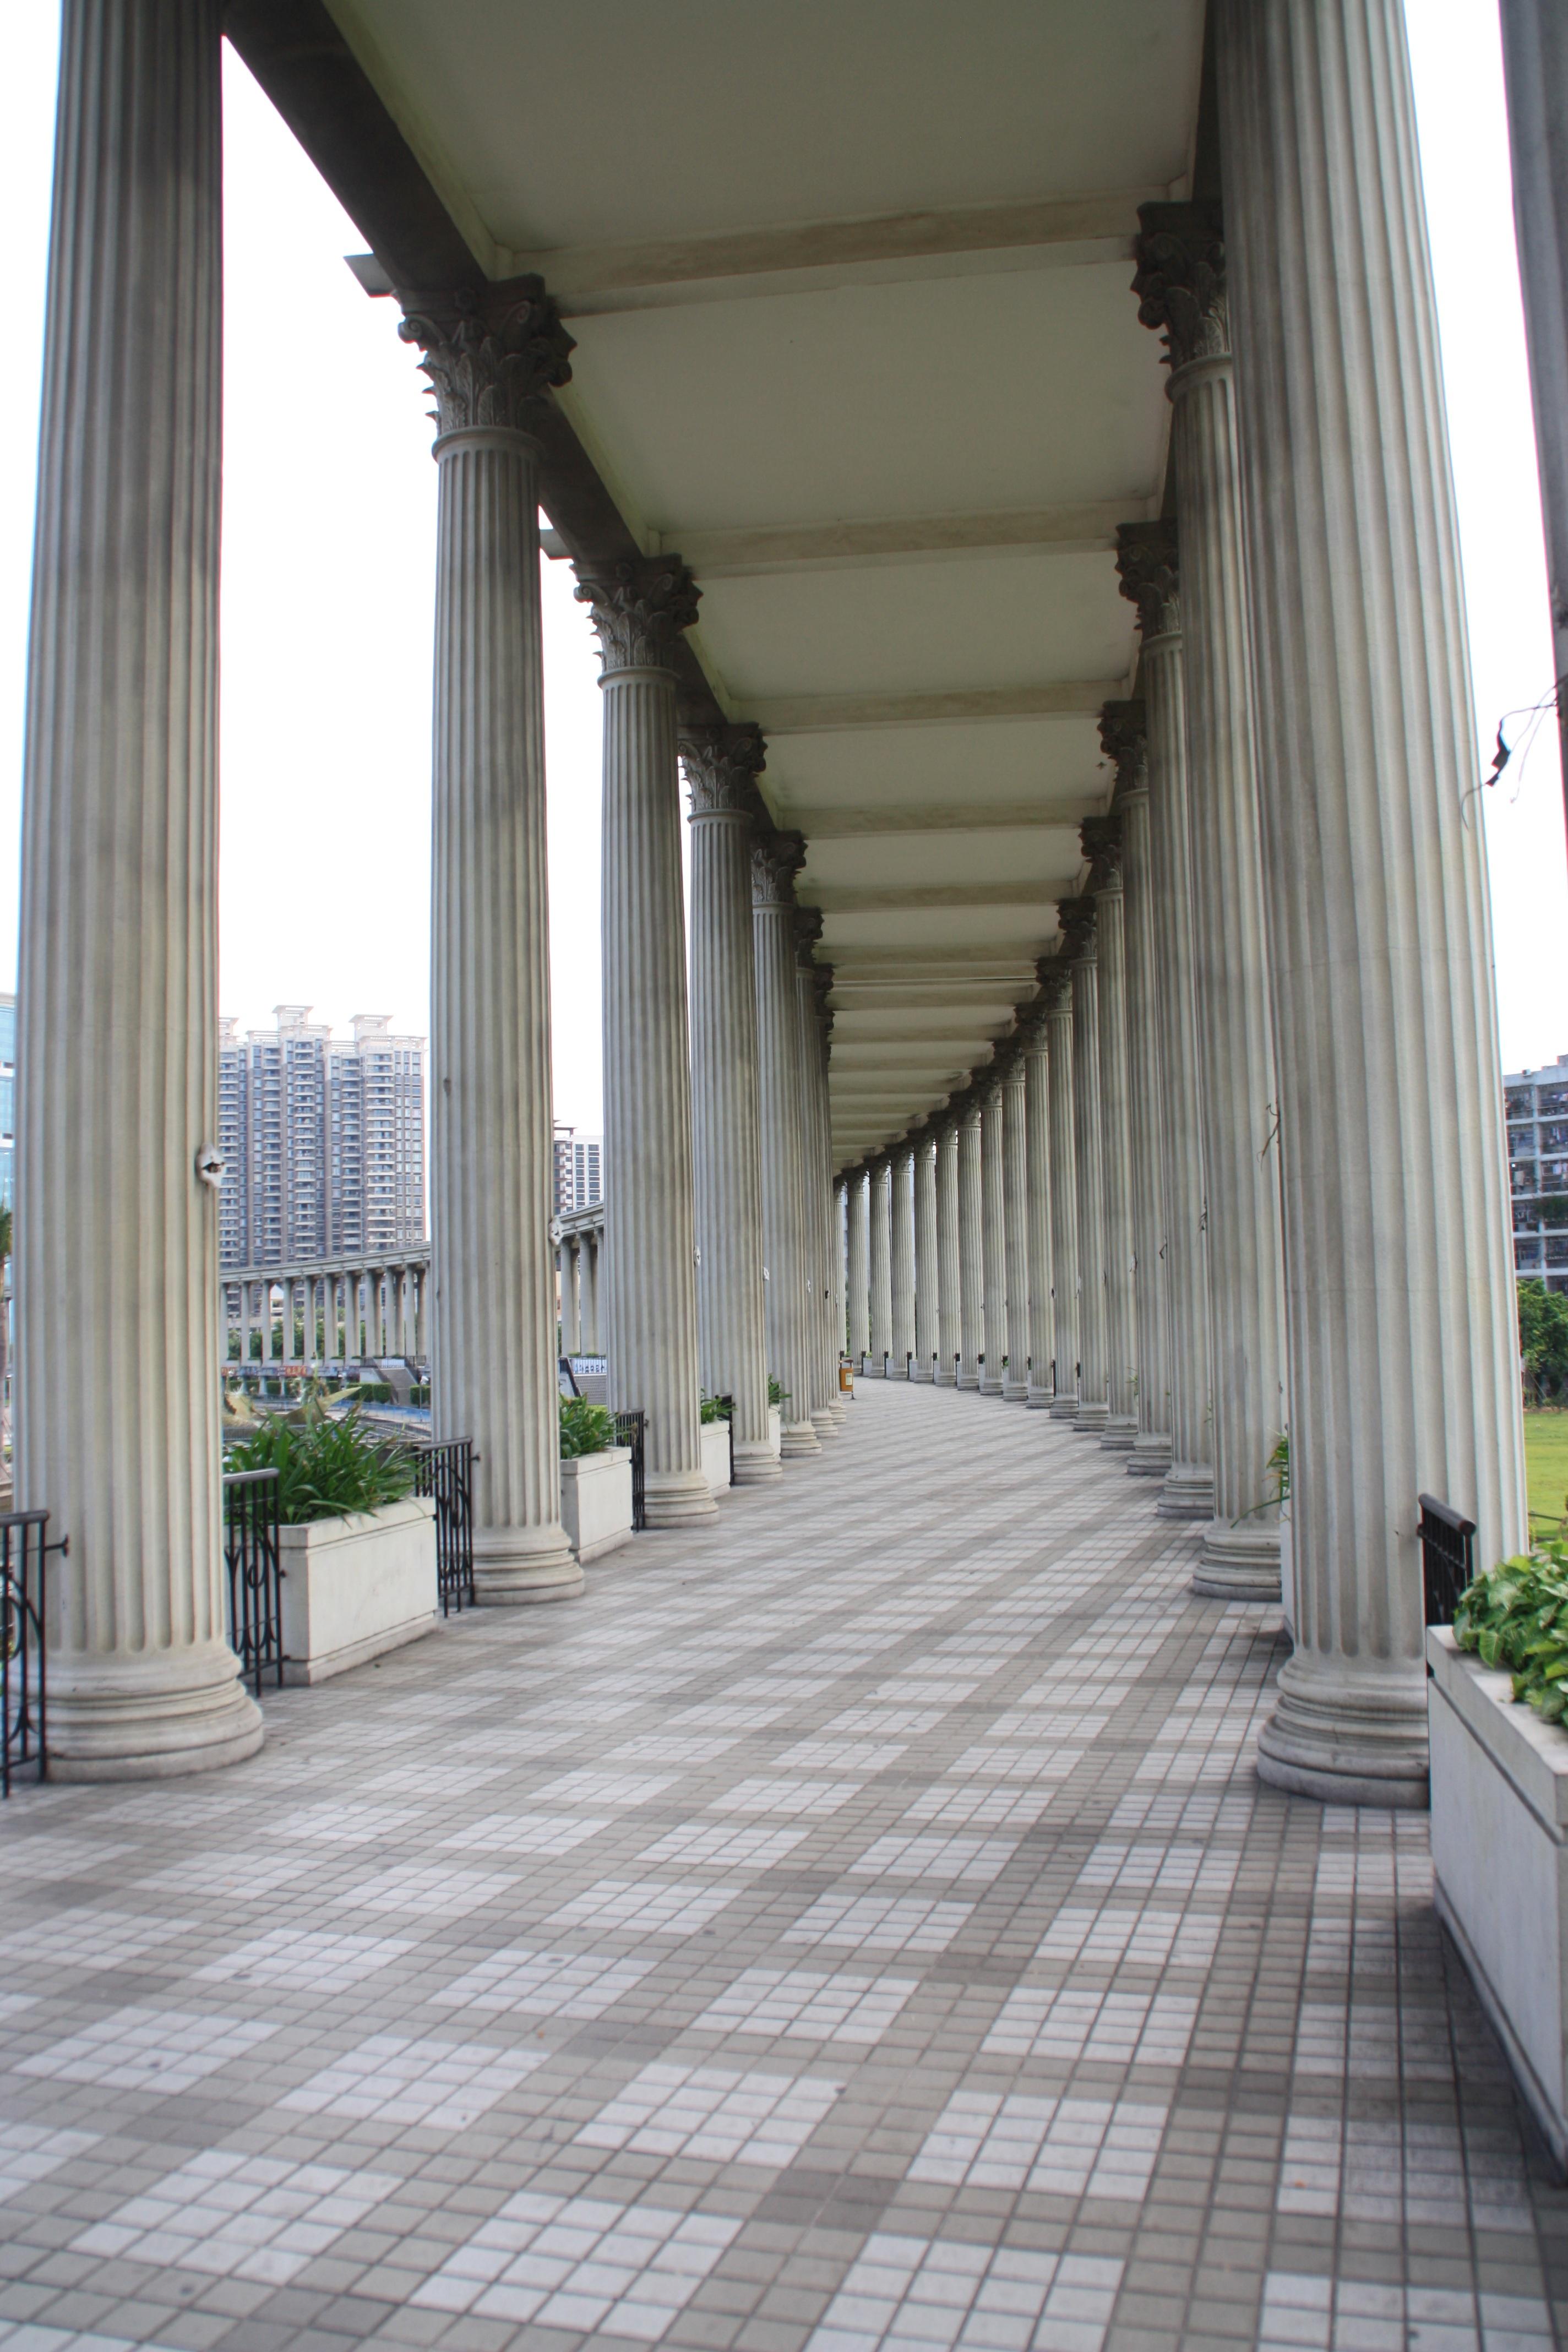 Architecture Structure Wood Walkway Arch Pillar Column Facade Interior Design Estate The Scenery Urban Corridor